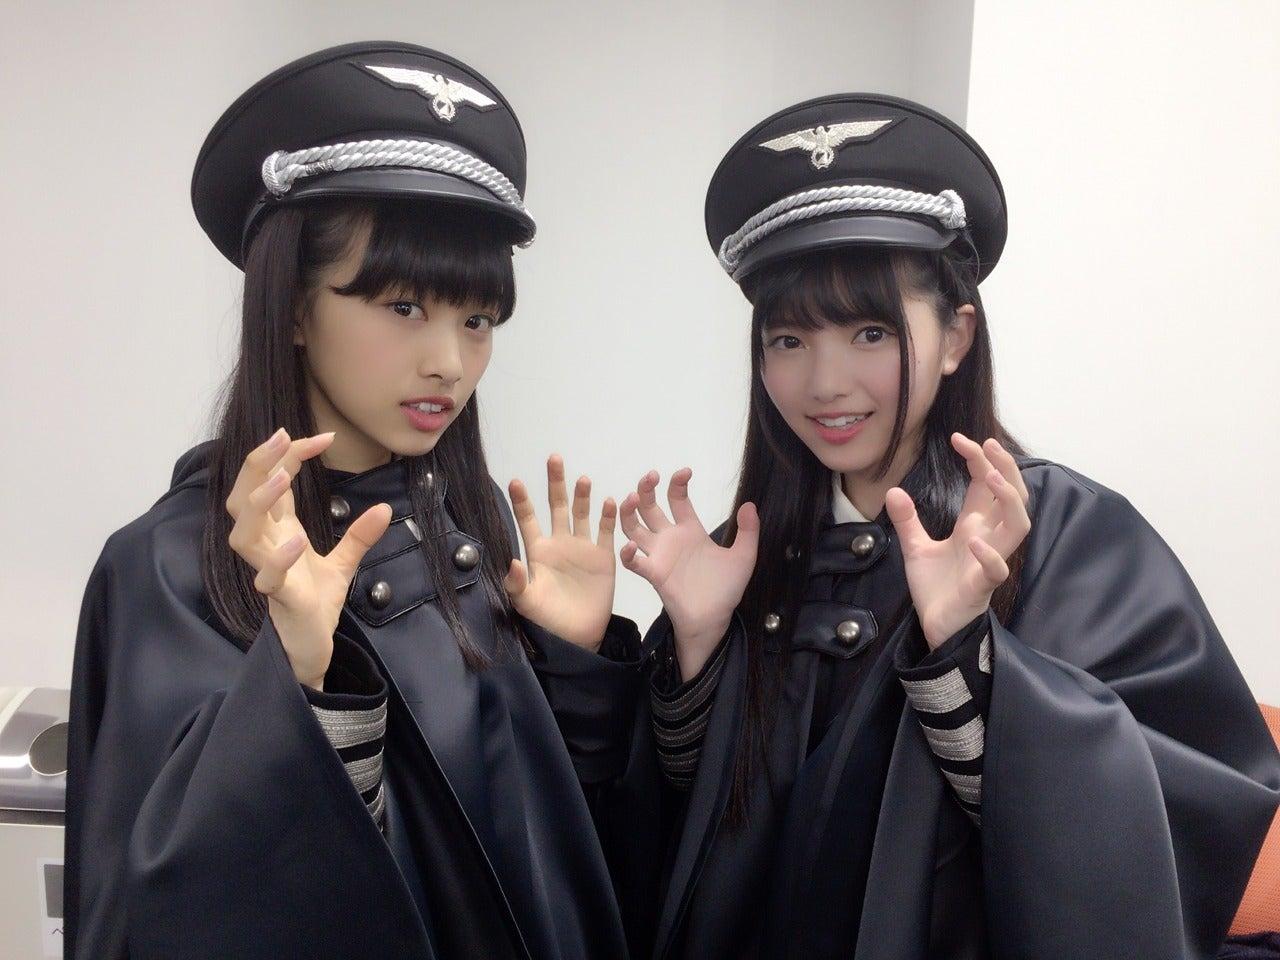 Japanese Idols Dress As Nazis For Halloween